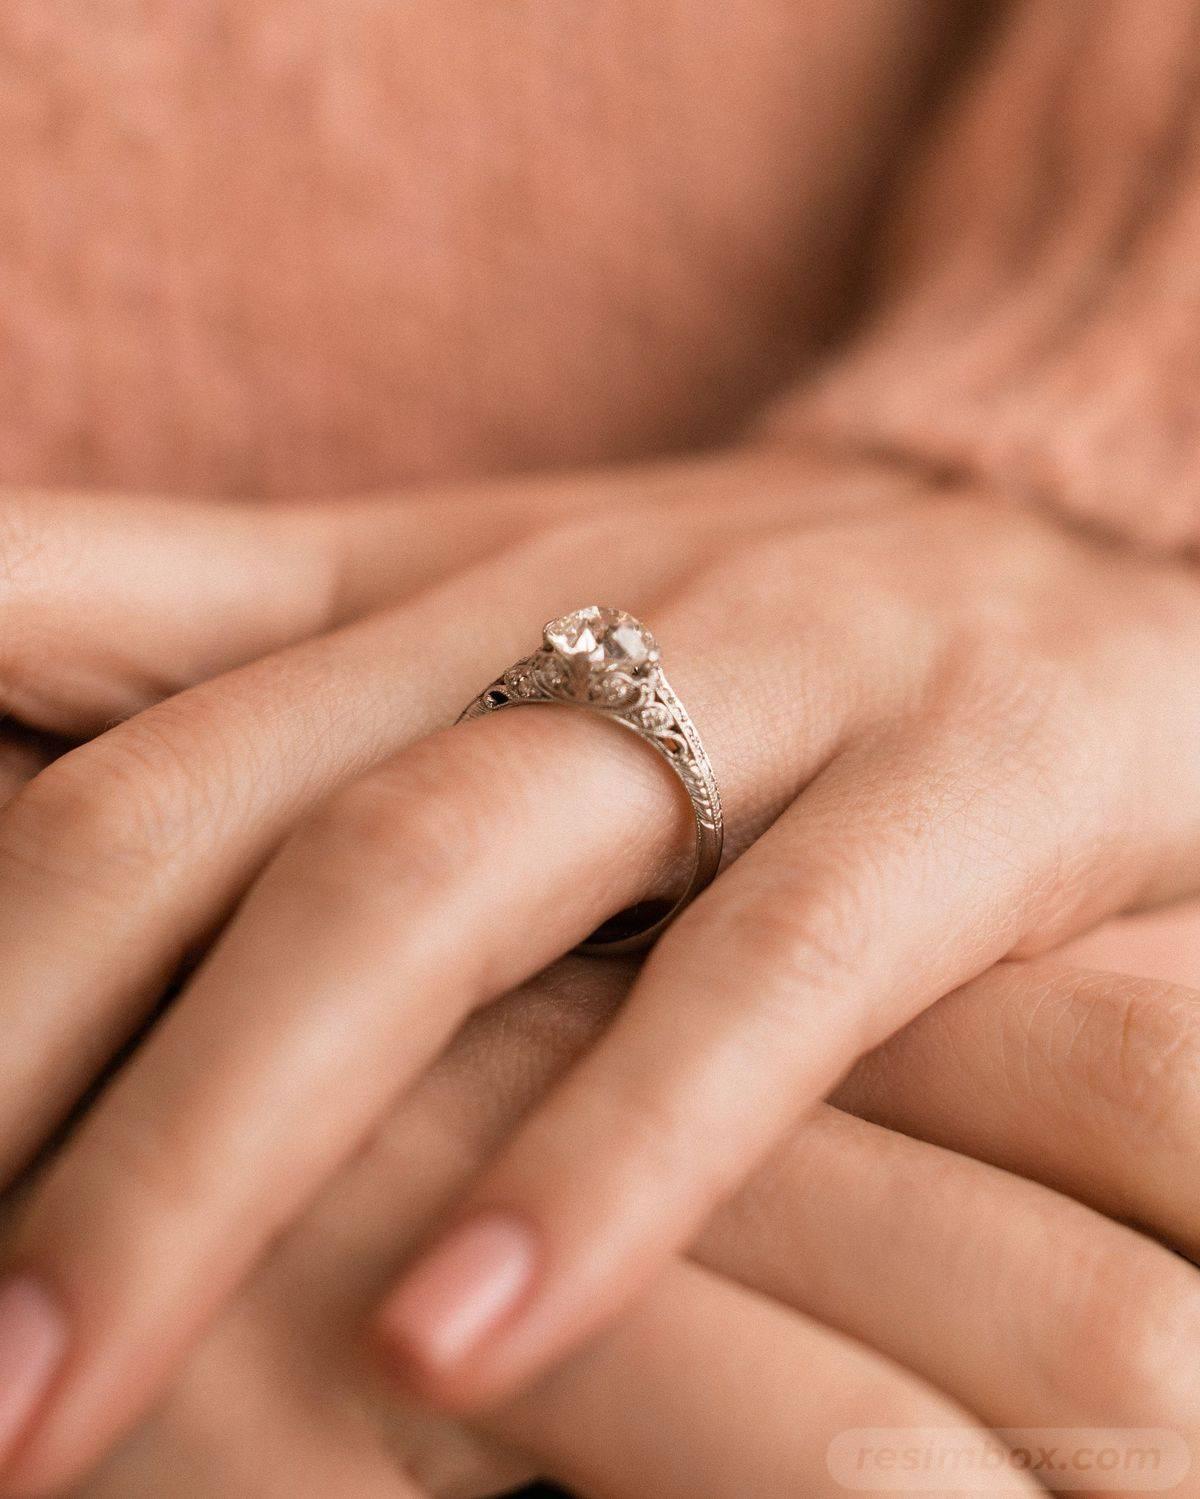 Art deco engagement ring-382594930841877468